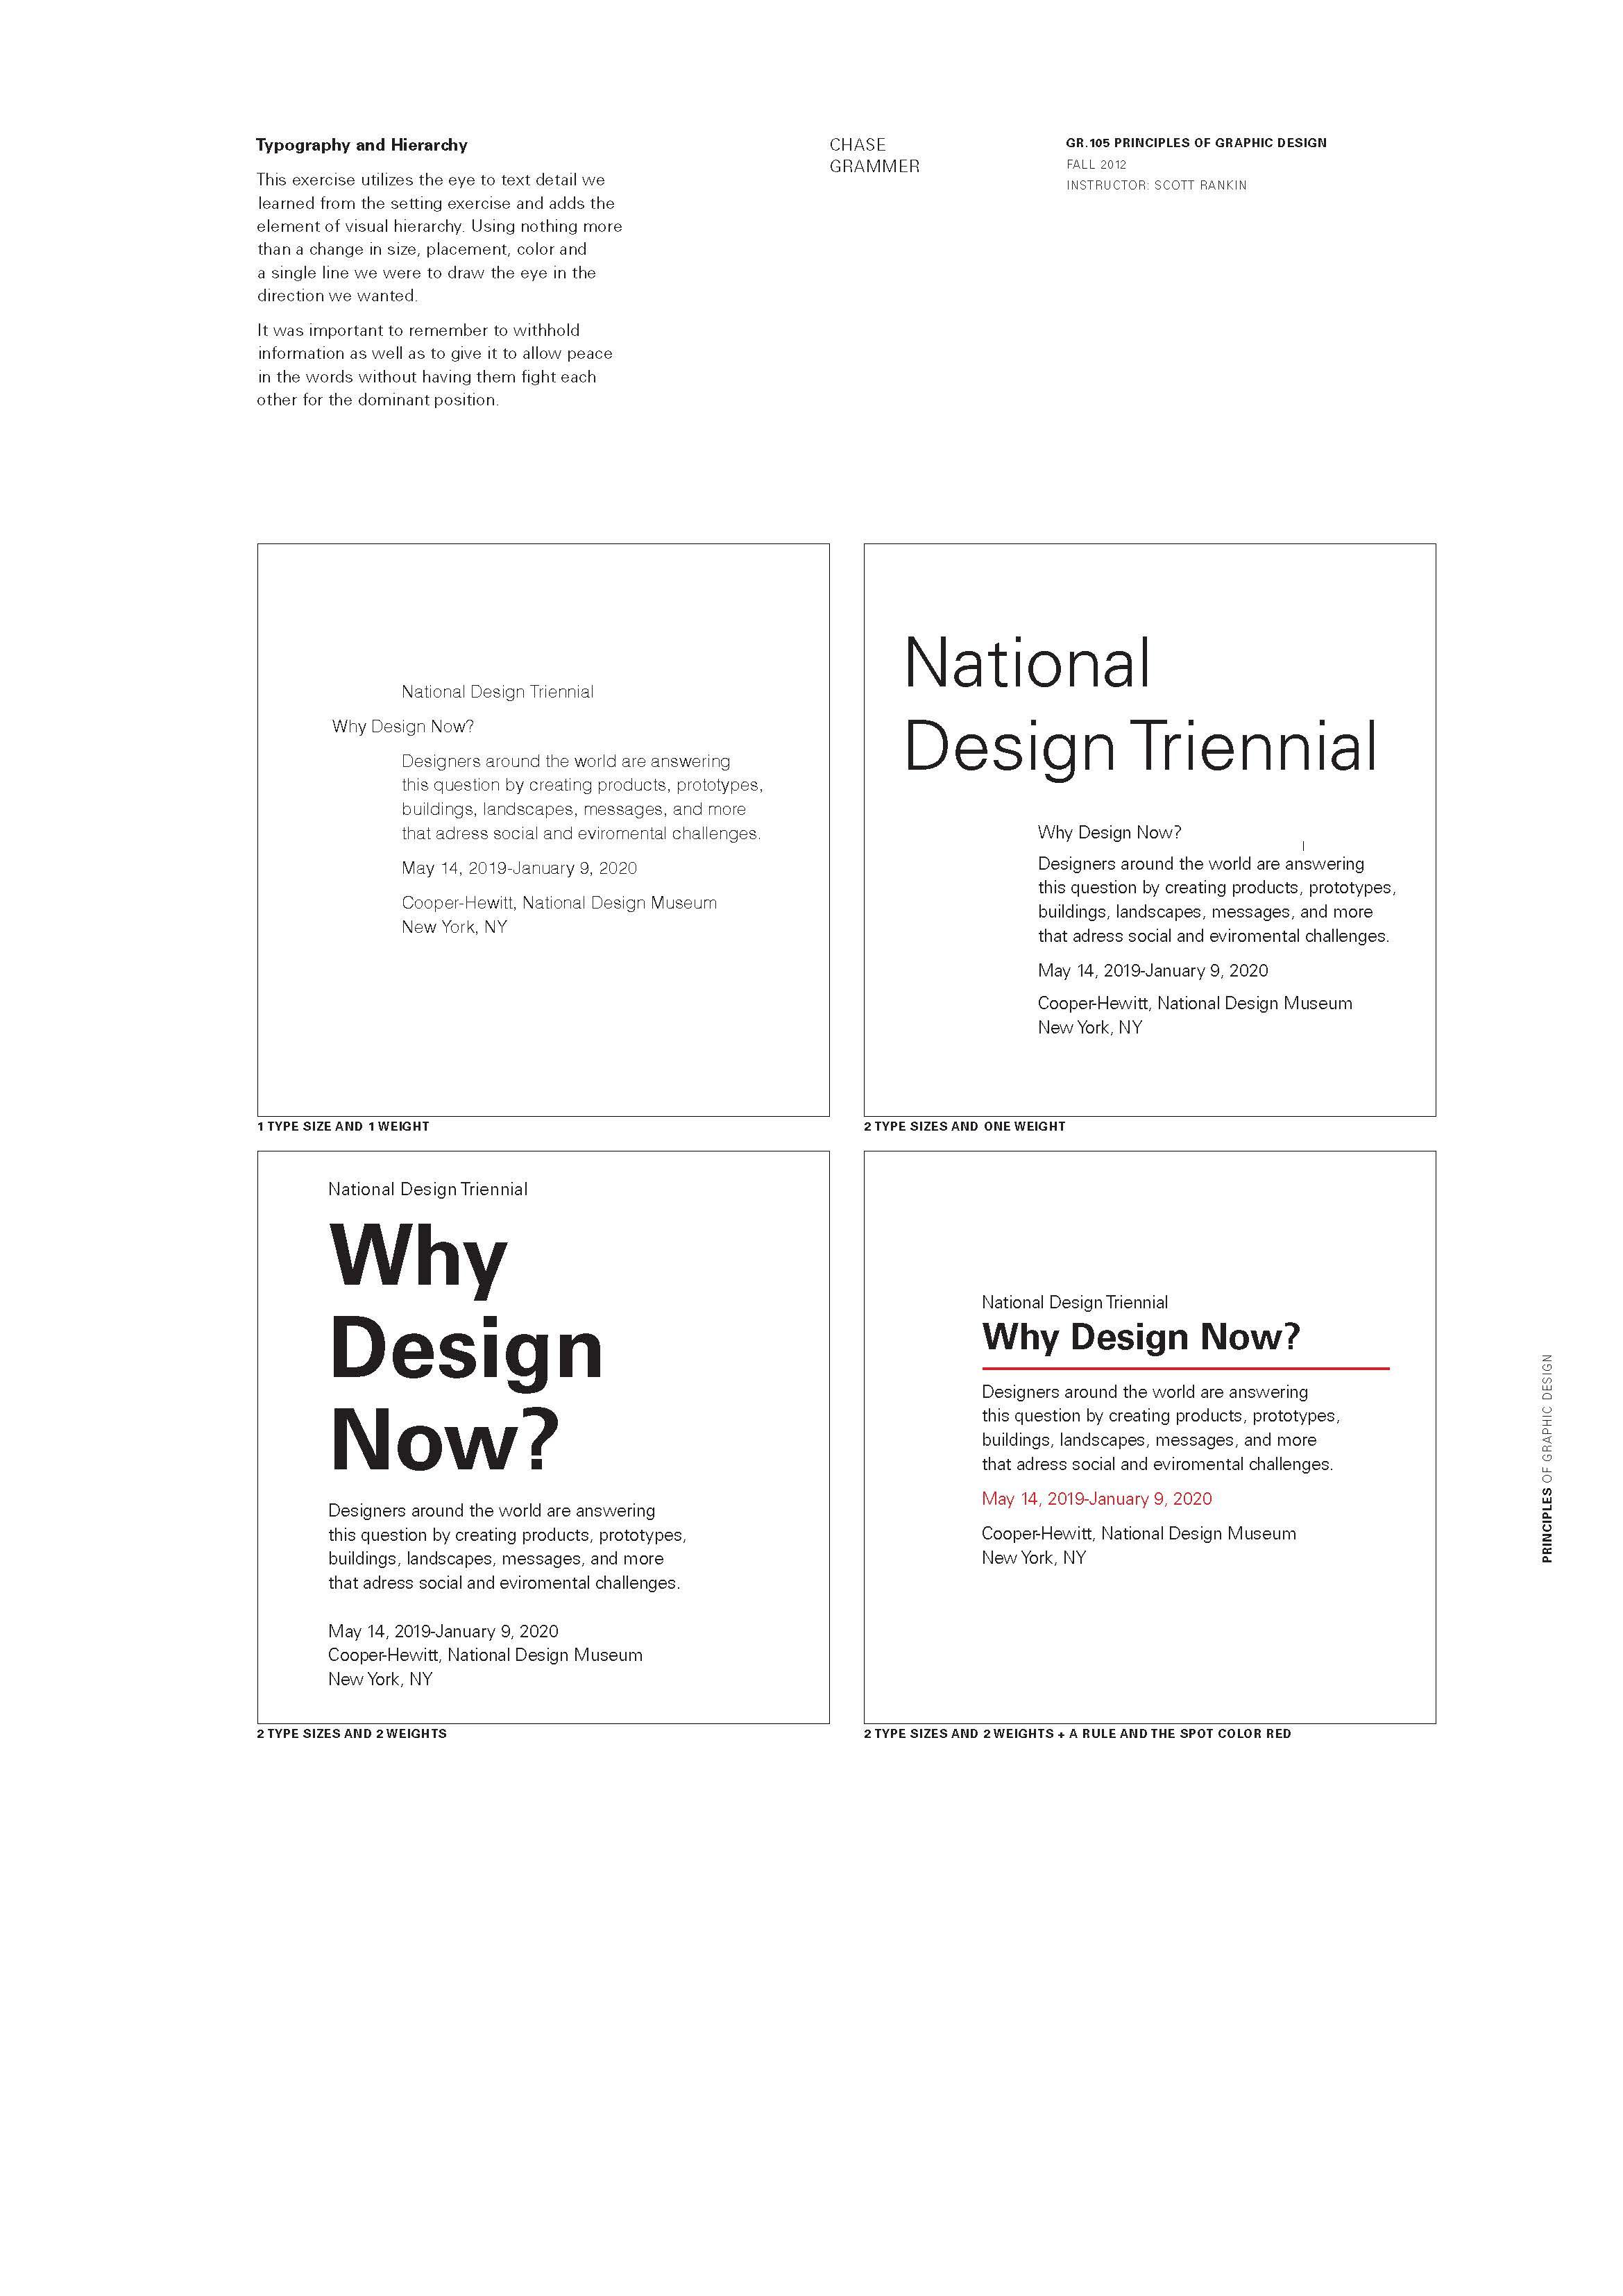 ScottFinal copy_Page_05.jpg